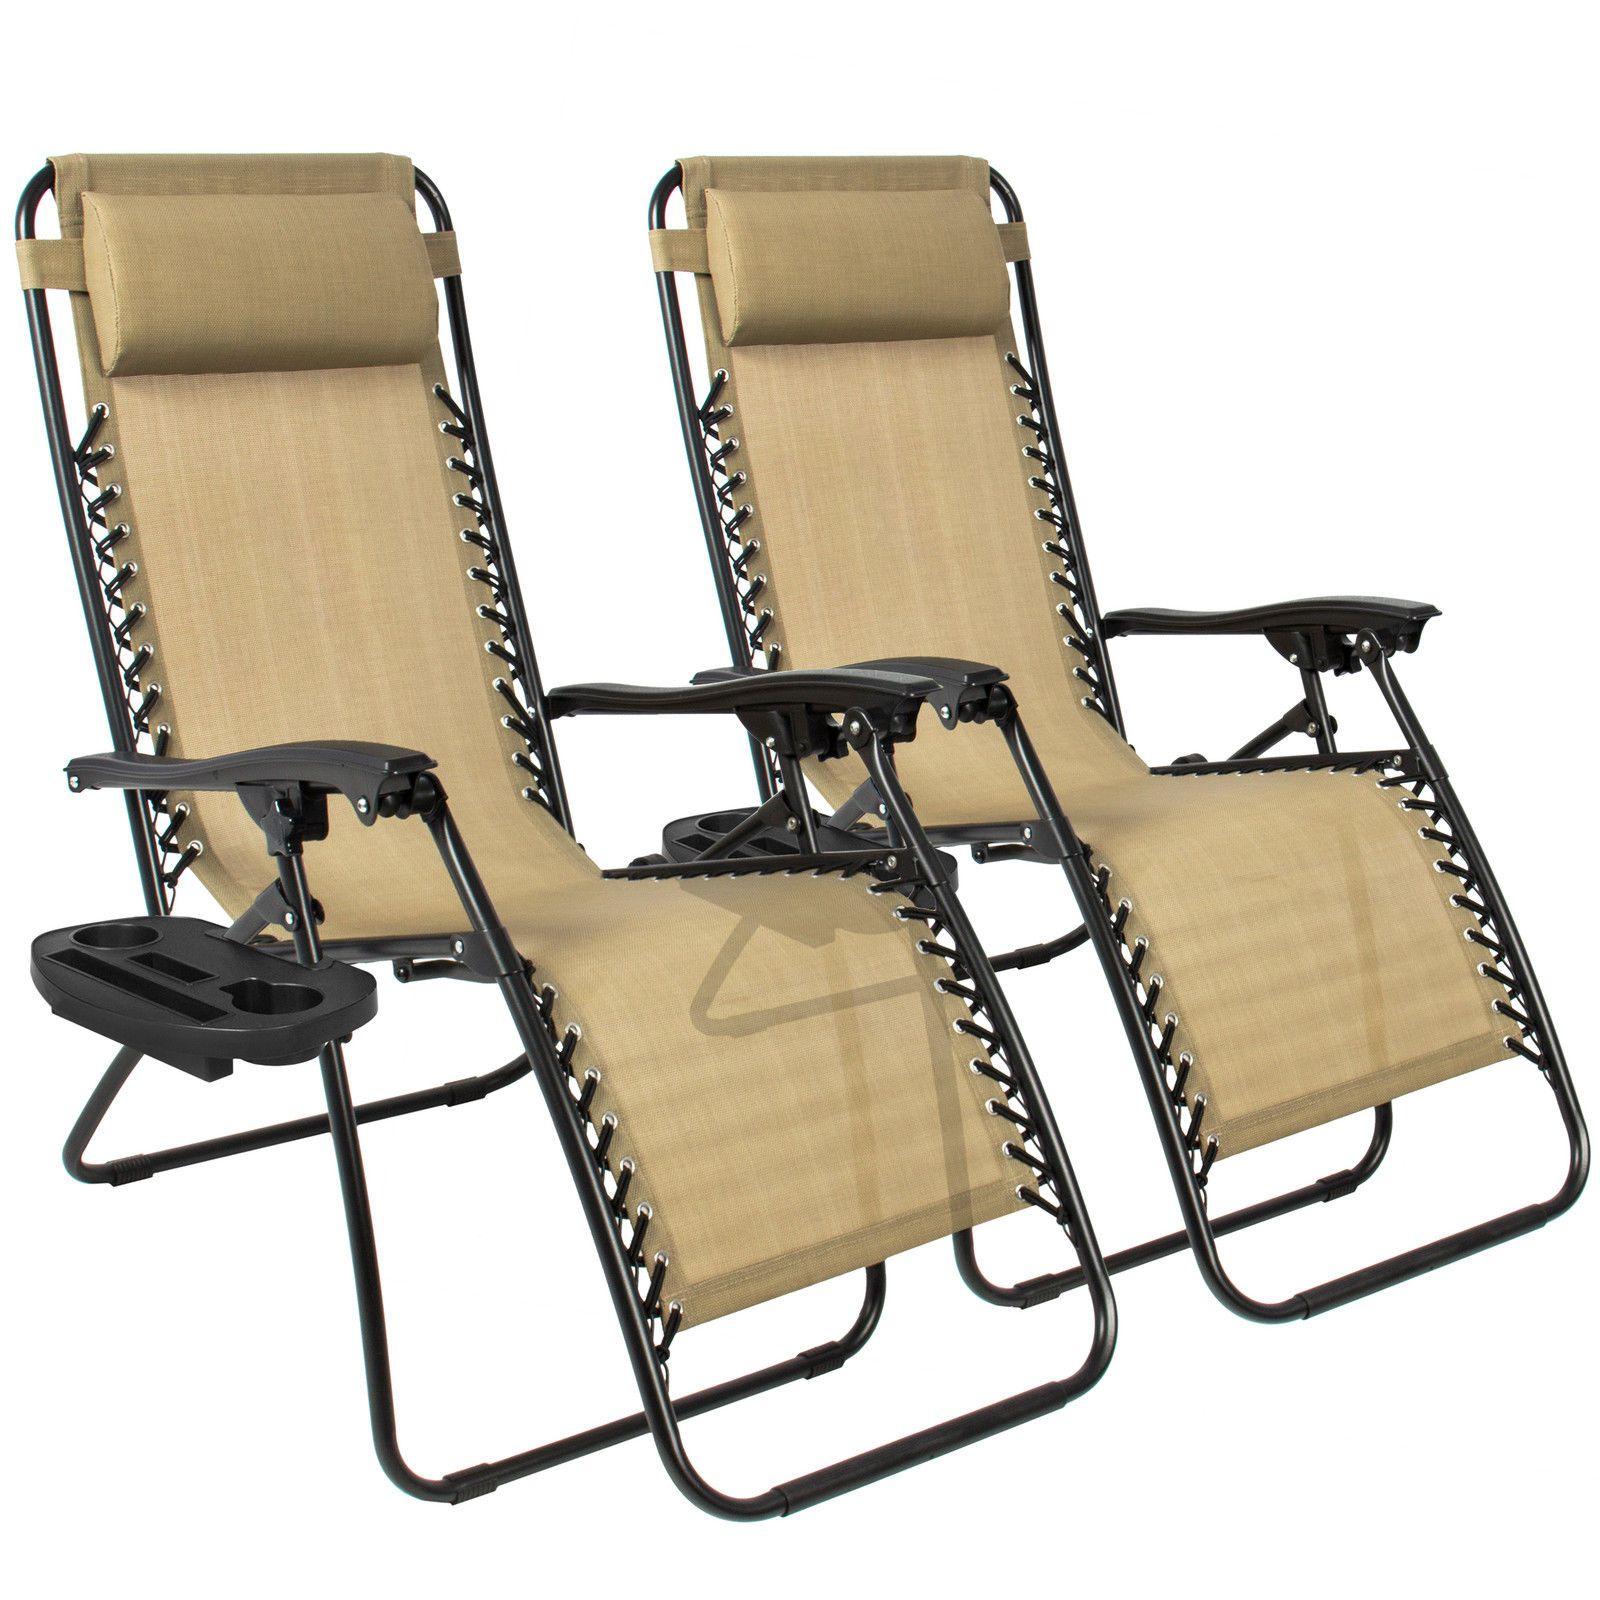 Zero Gravity Chairs Case 2 Tan Lounge Patio Chairs Outdoor Yard